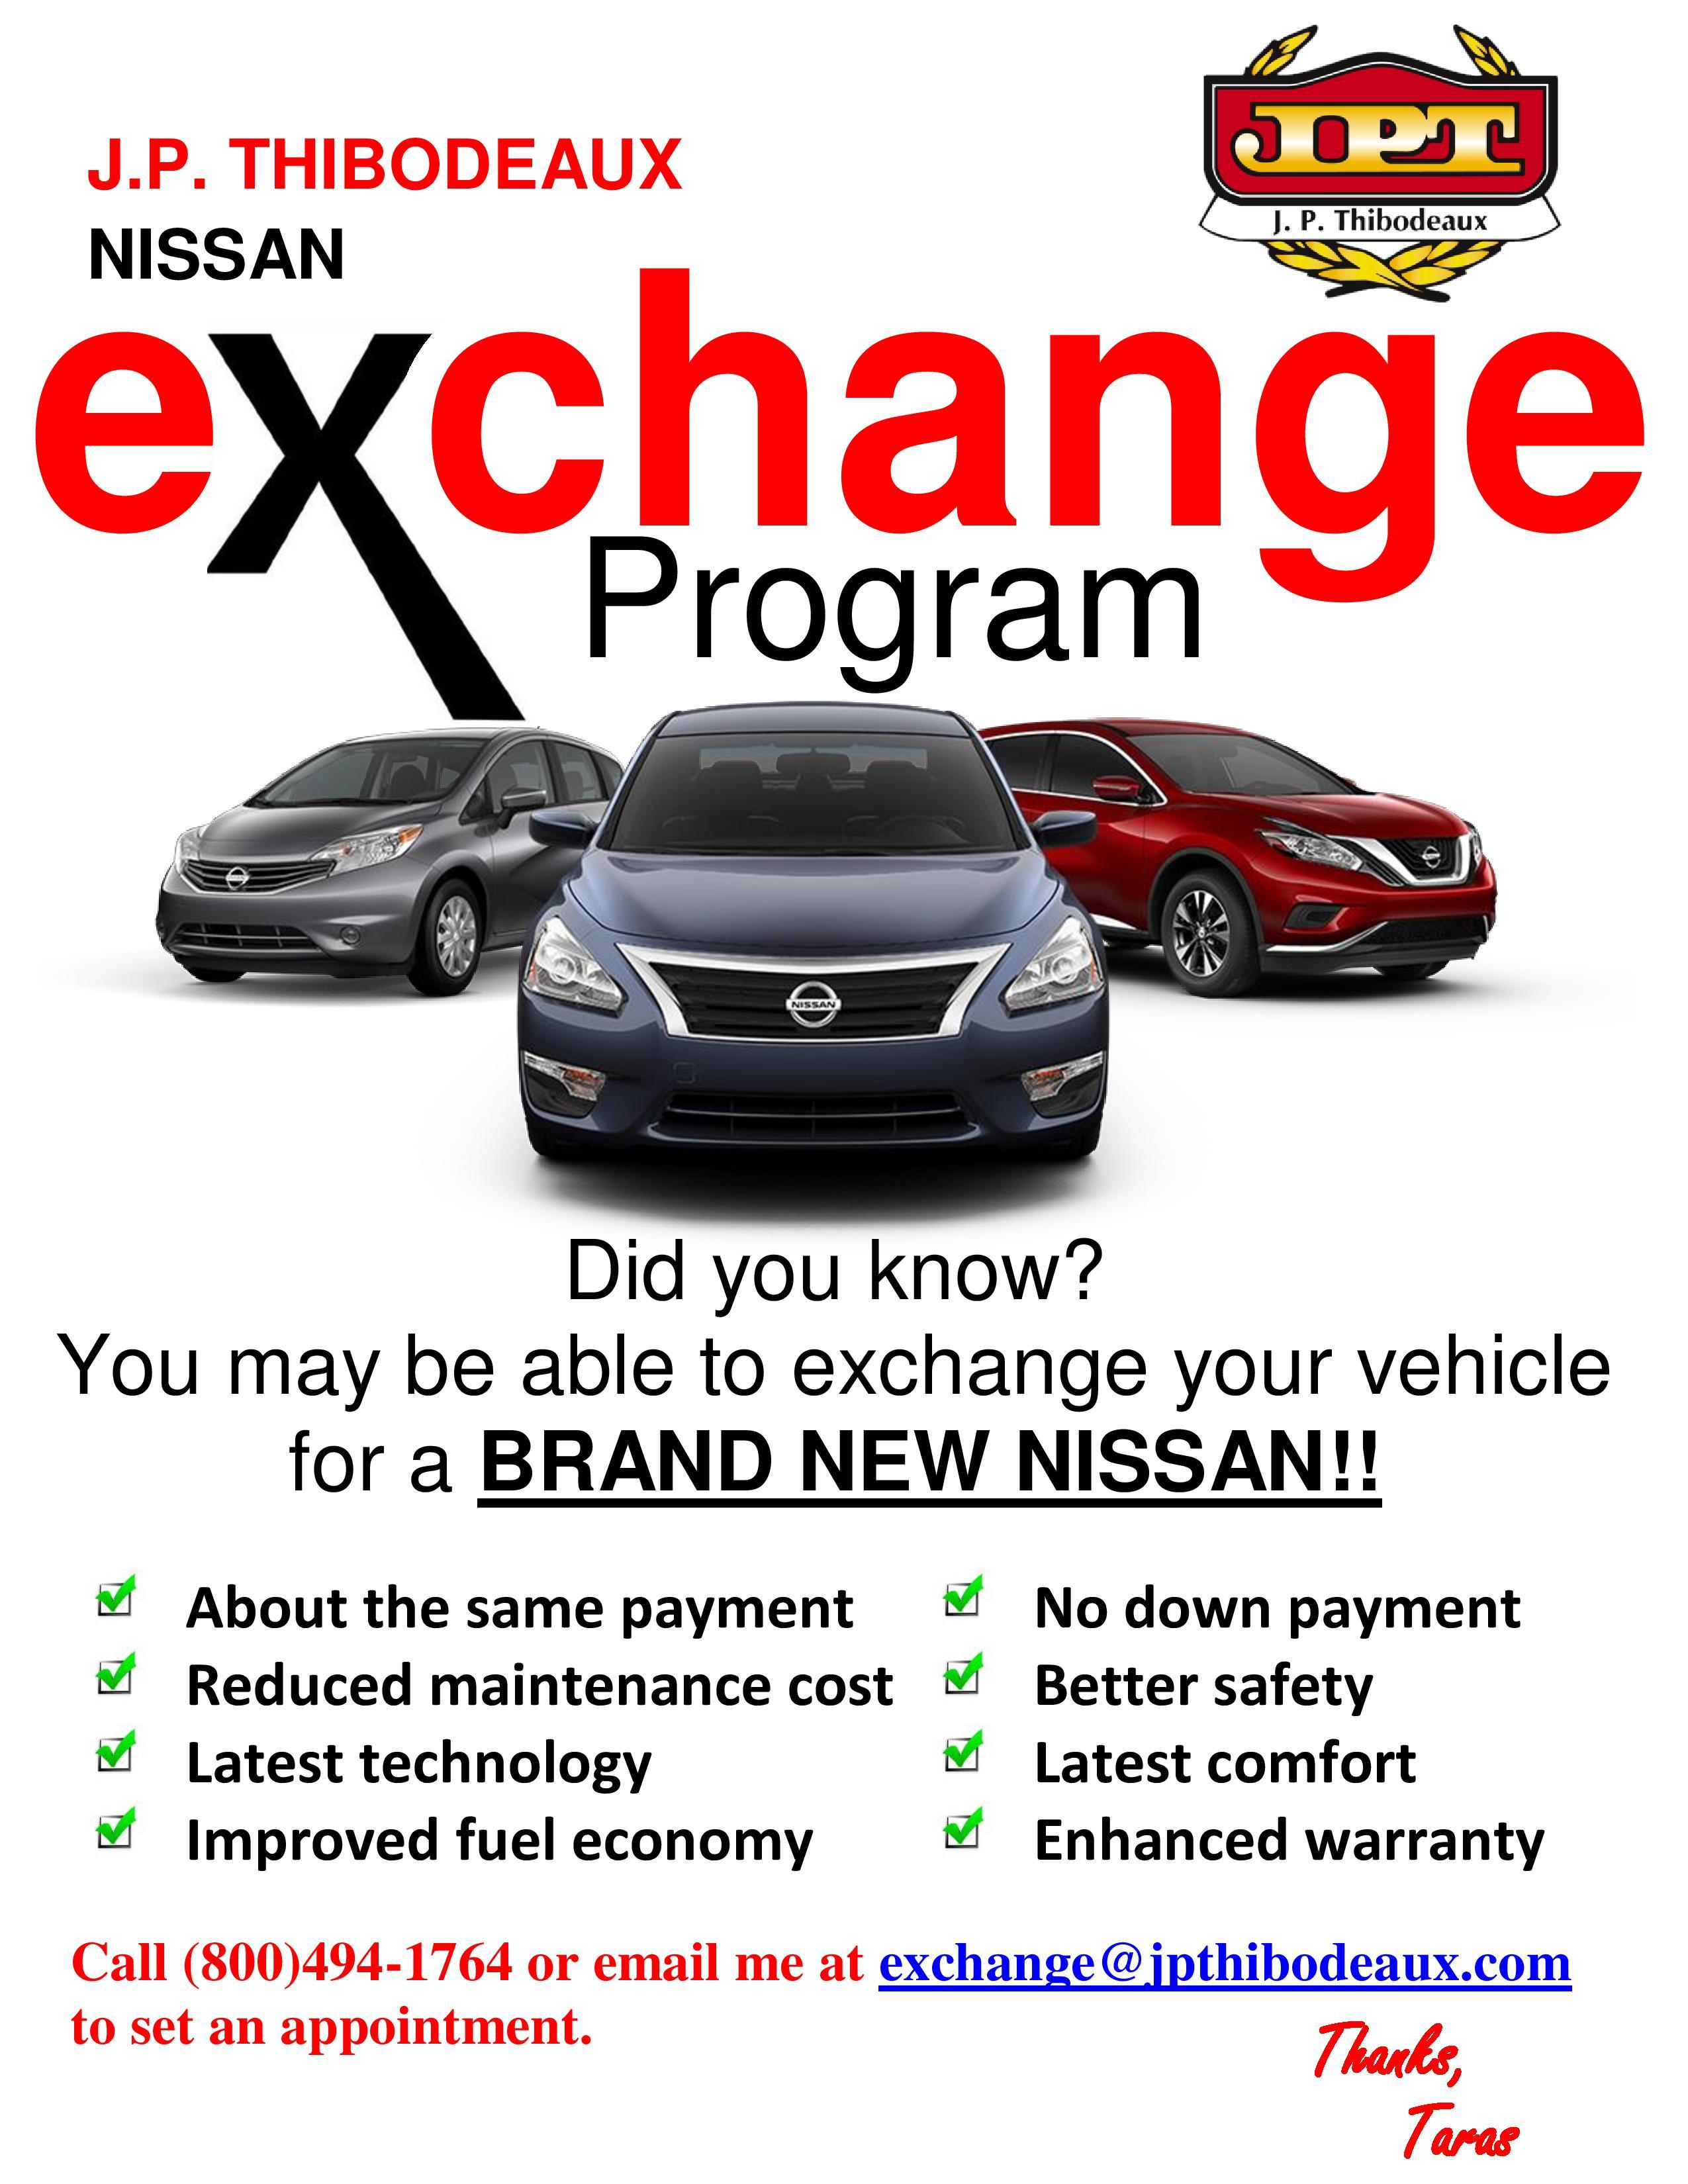 Jp Thibodeaux Used >> J.P. Thibodeaux Nissan | New Nissan dealership in New ...